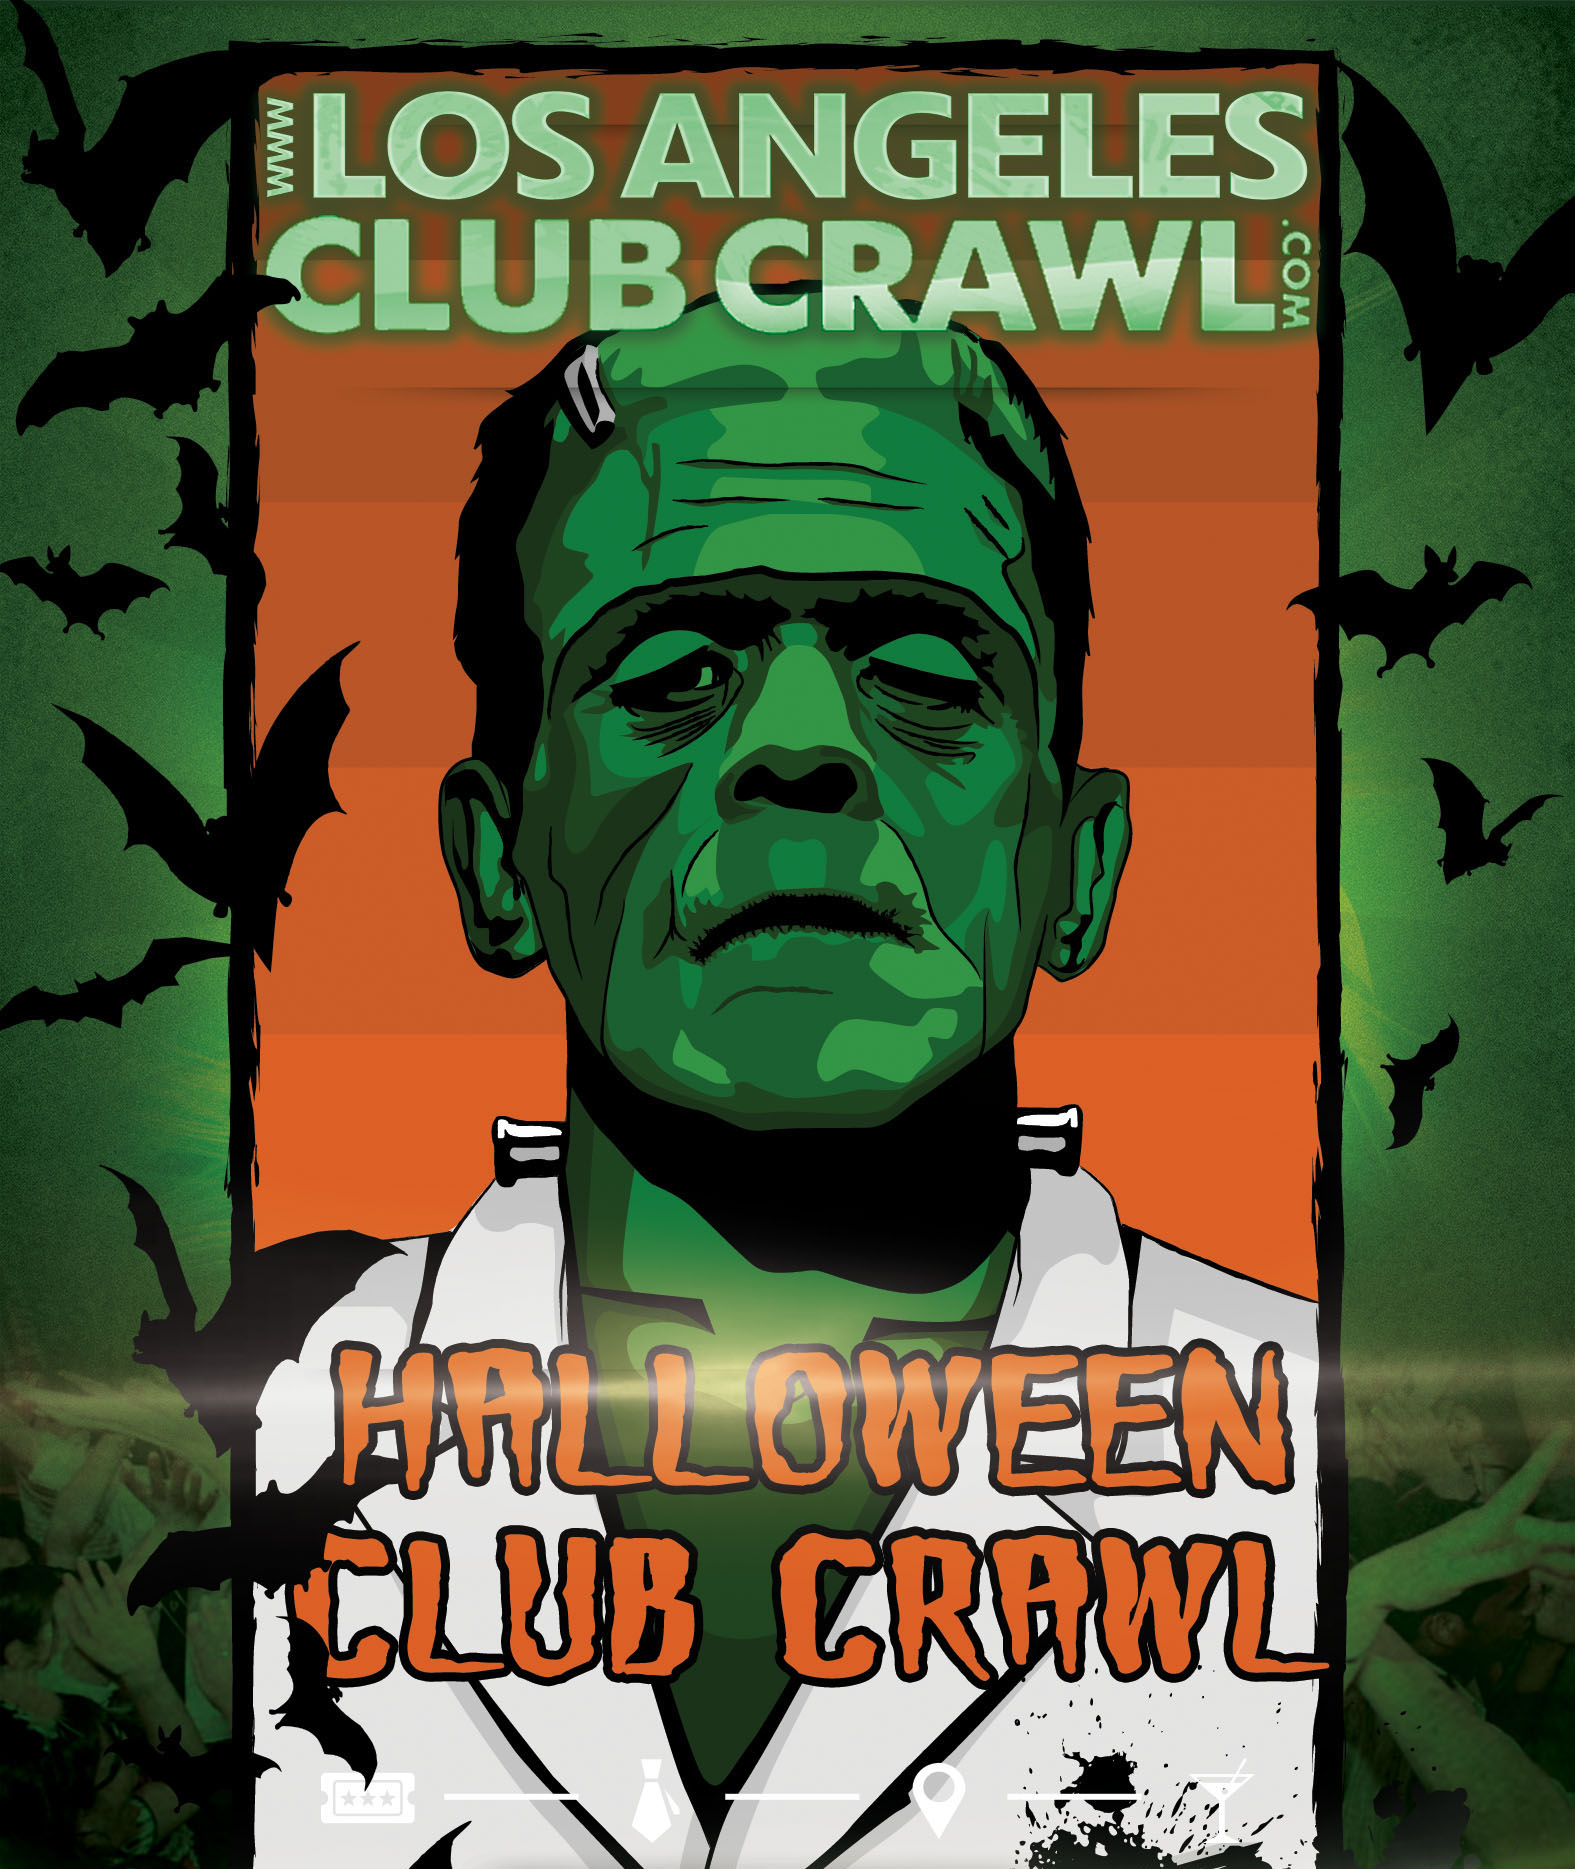 Free Halloween Party 2020 Downtown La Halloween Events – Los Angeles Club Crawl